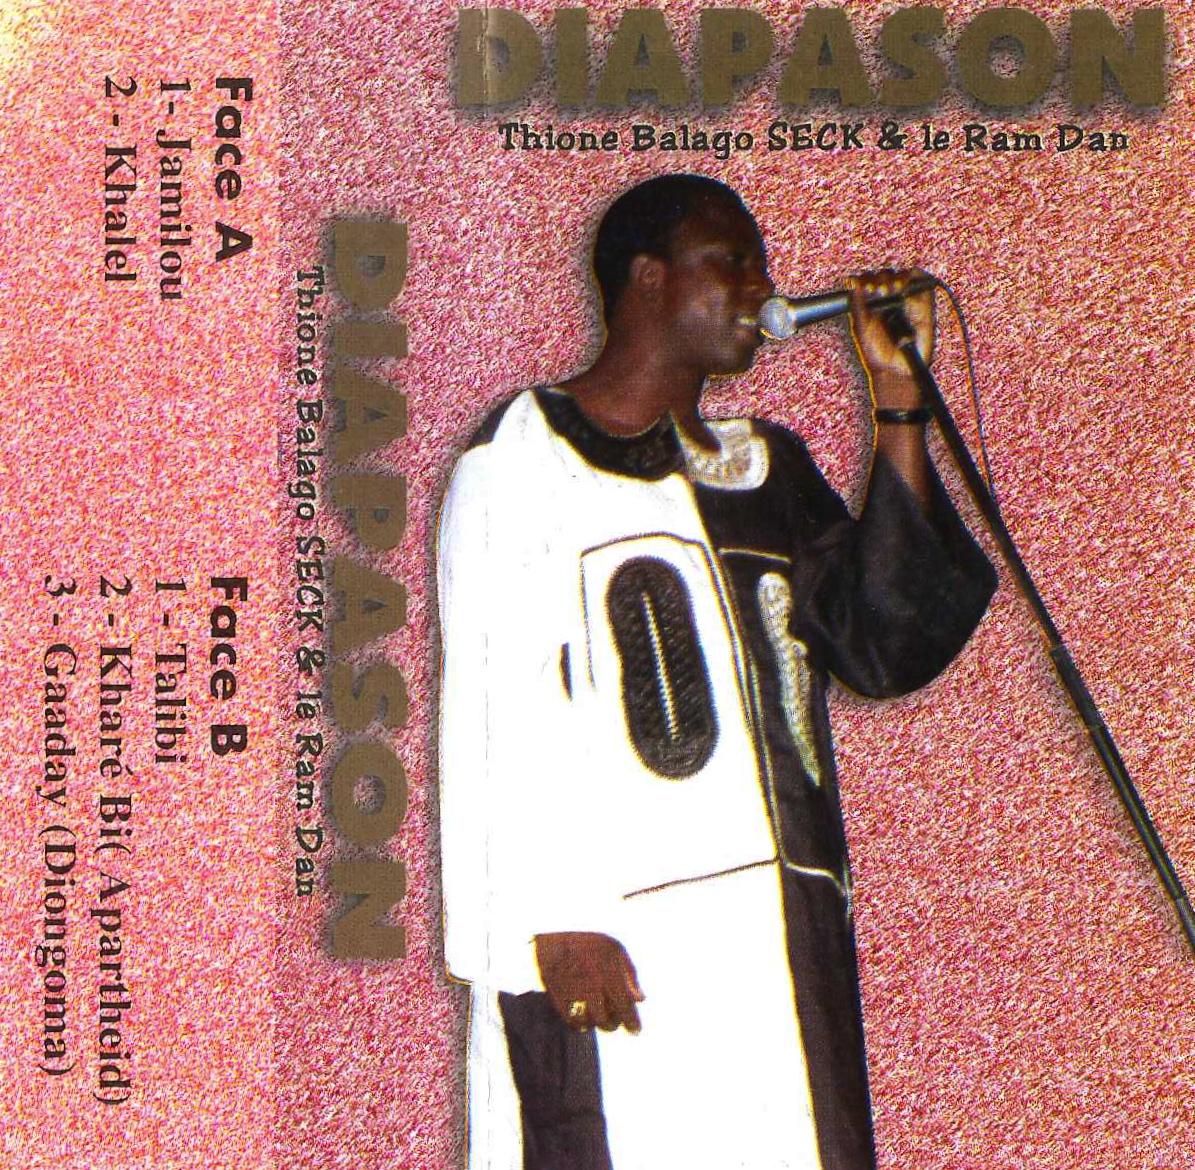 Thione Balago Seck & Le Ram Dan – Diapason Vol.2 SENEGAL Mabalax Music ALBUM